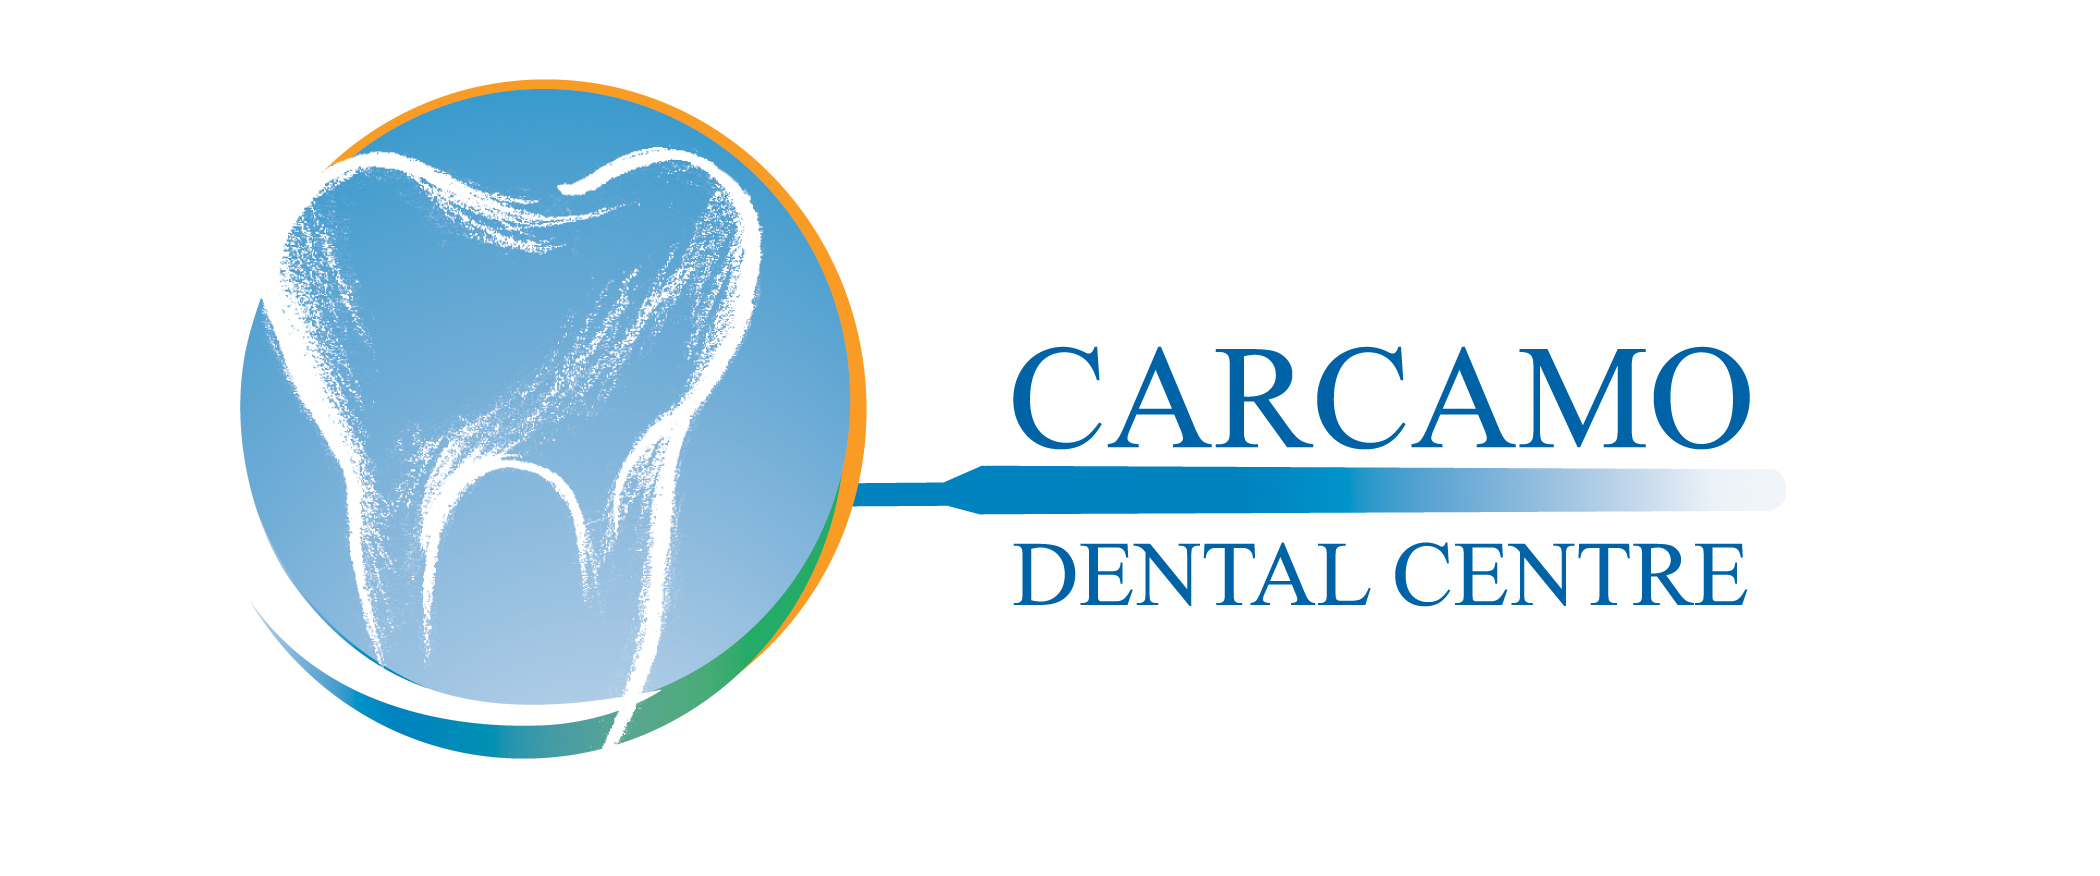 Carcamo Dental Centre image 1